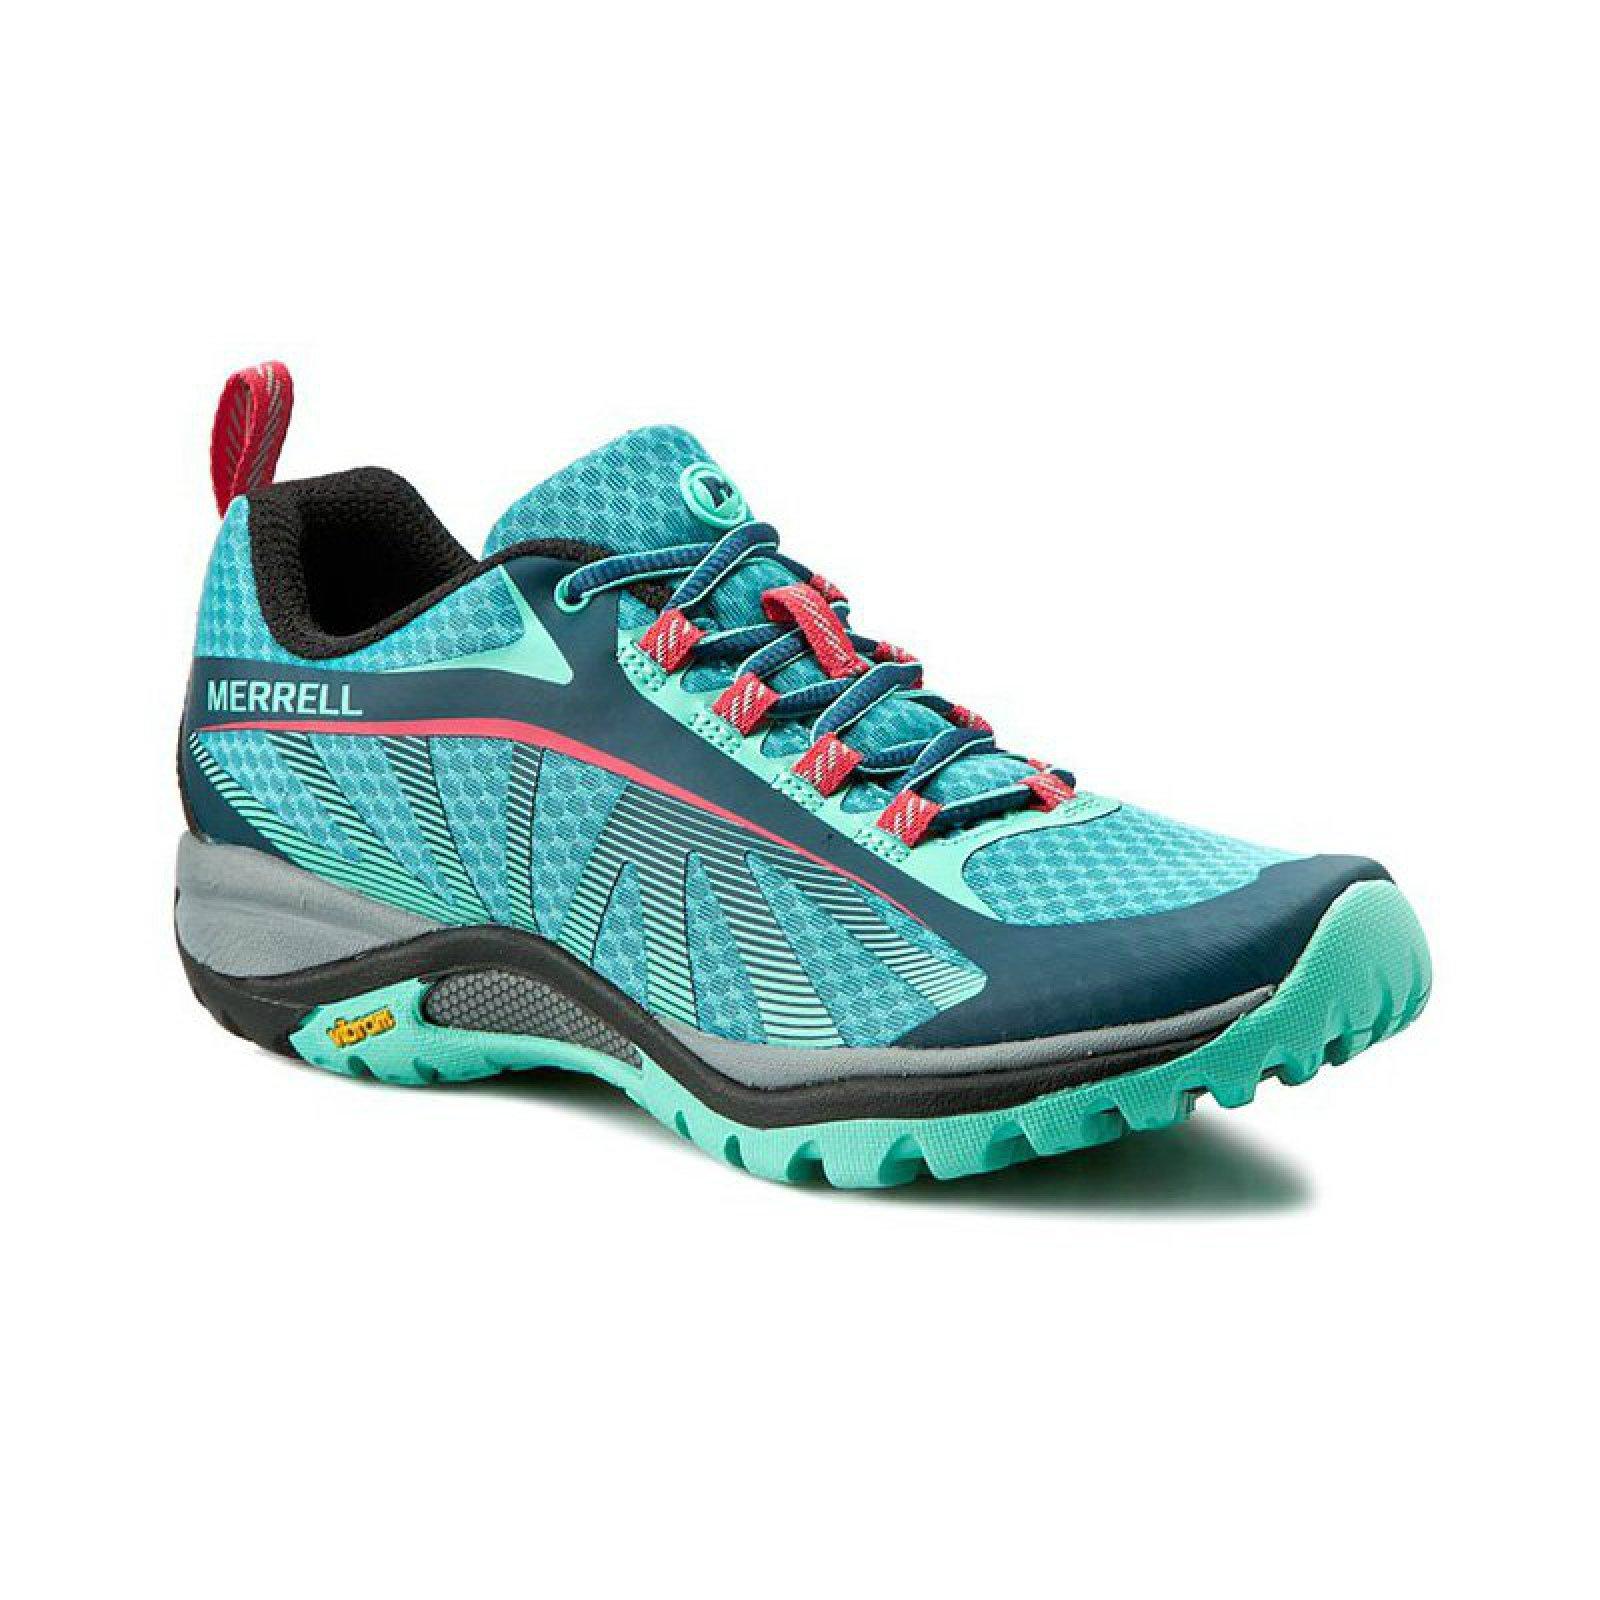 Outdoorové boty Merrell Siren Edge W J35514 - Actisport.cz b8b3c564688